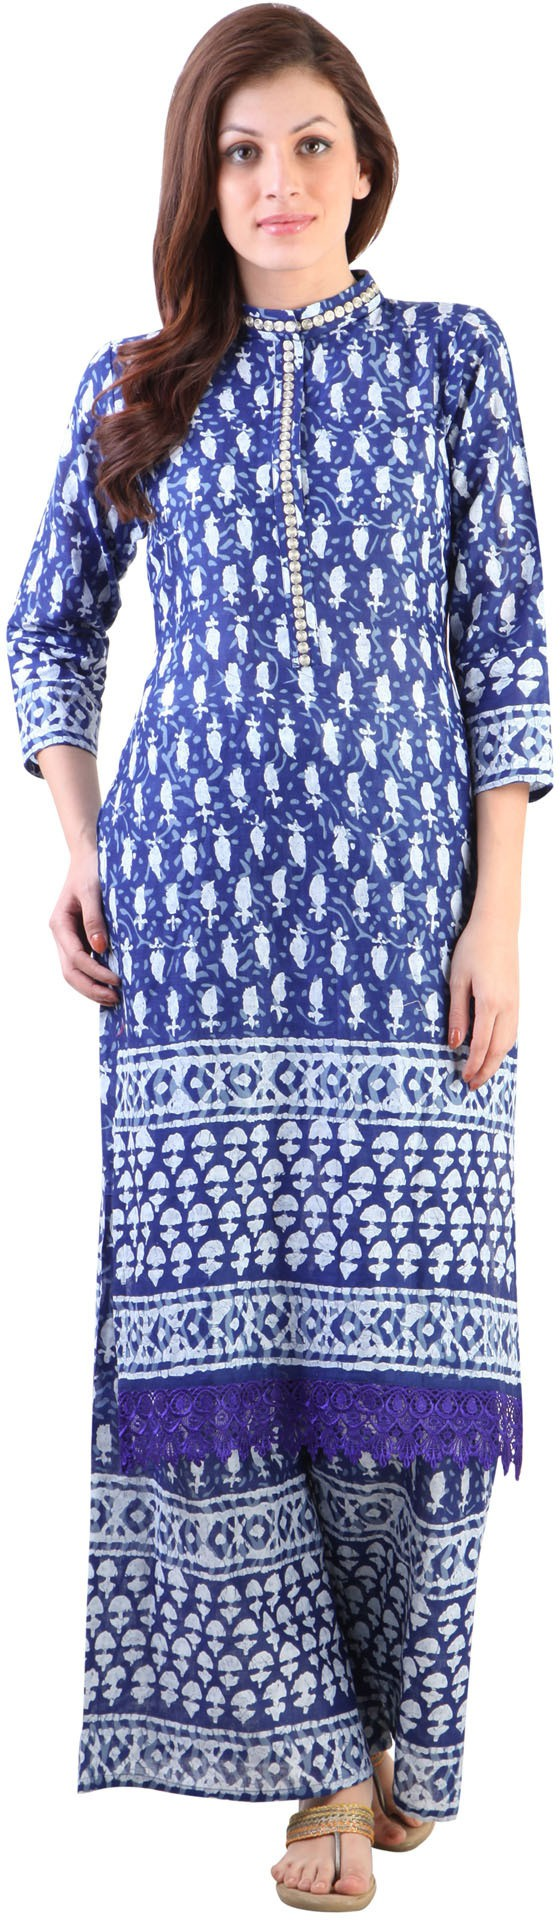 Libas Printed Womens Straight Kurta(Blue, White)